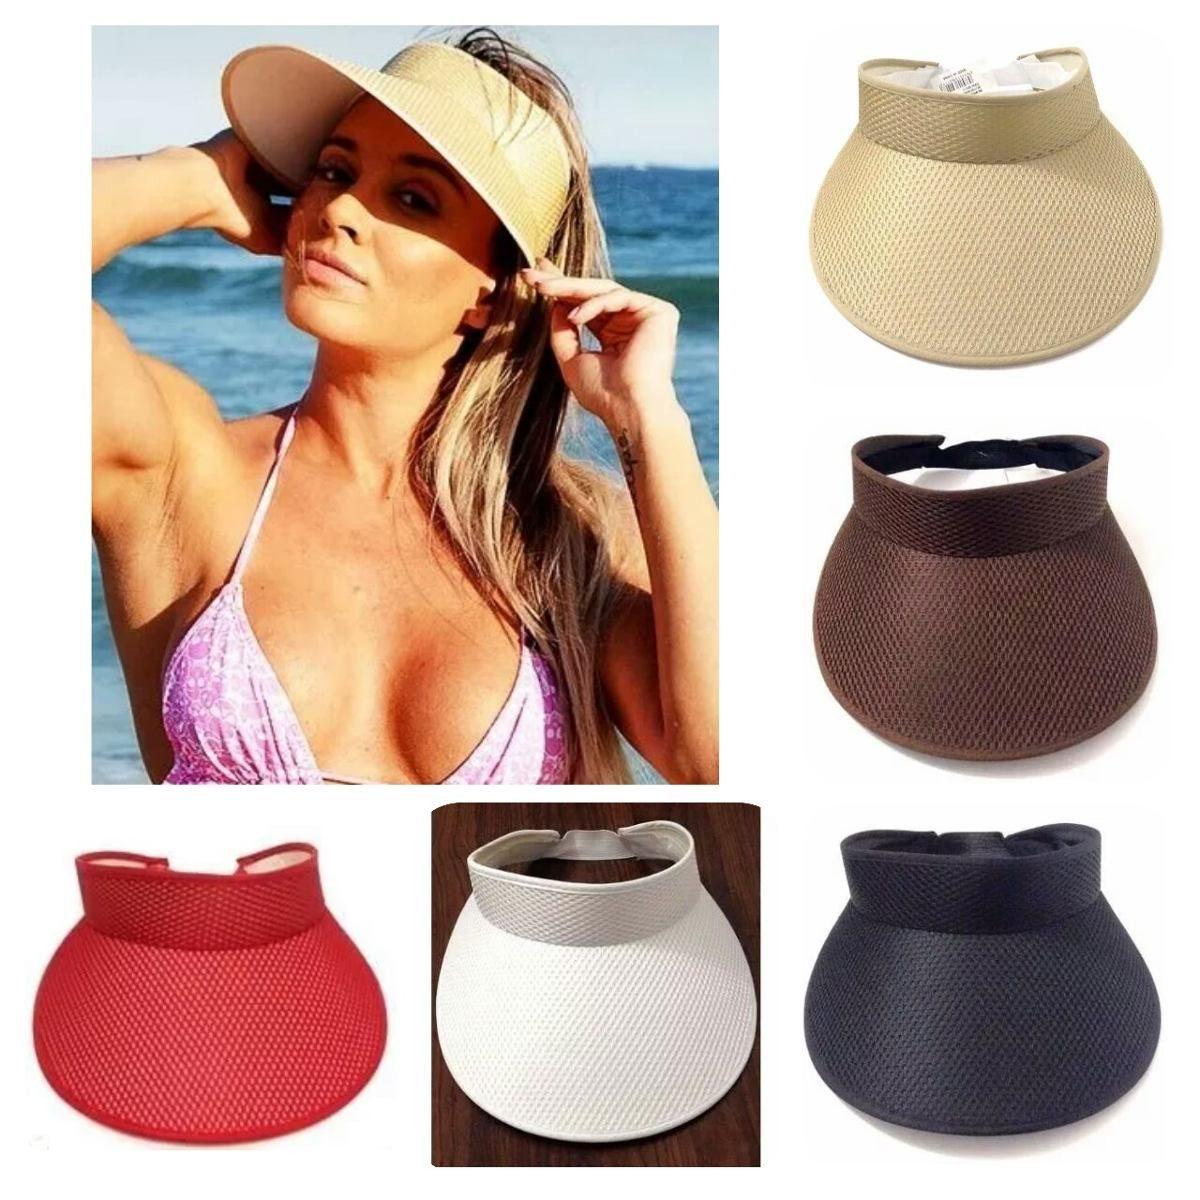 ad9e34921e587 viseira chapéu de praia igual da juju salimeni. Carregando zoom.